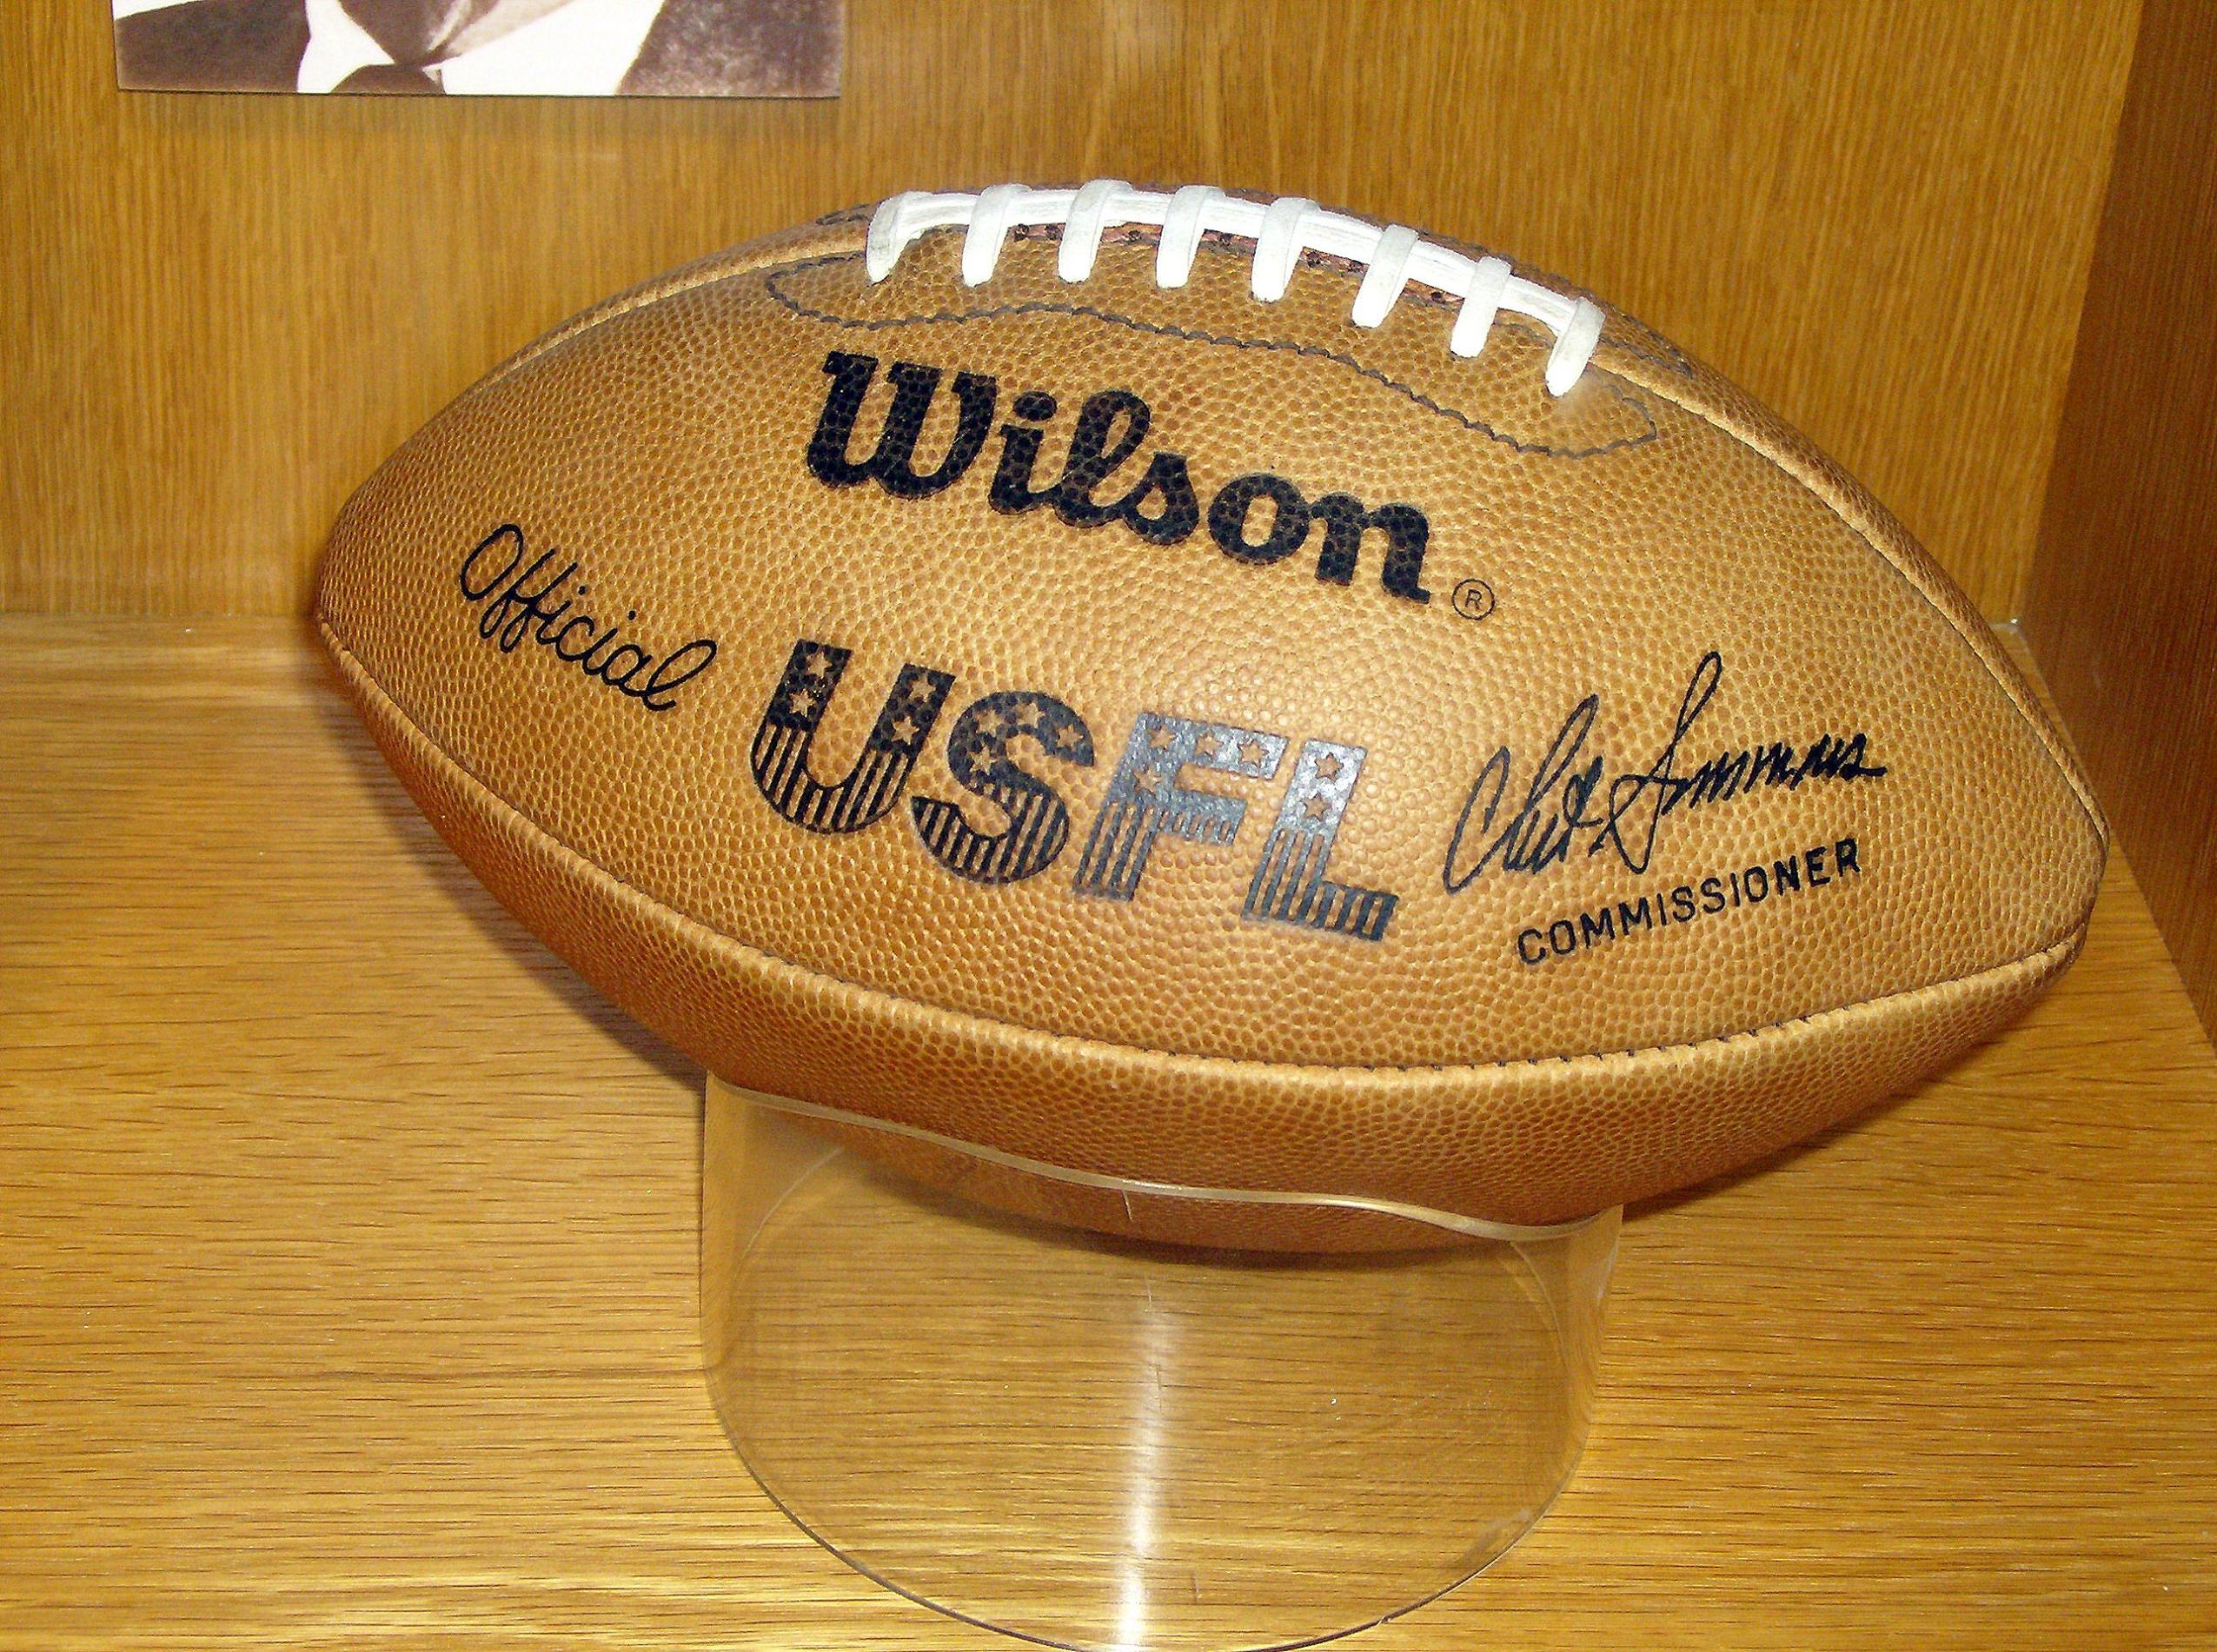 USFL football